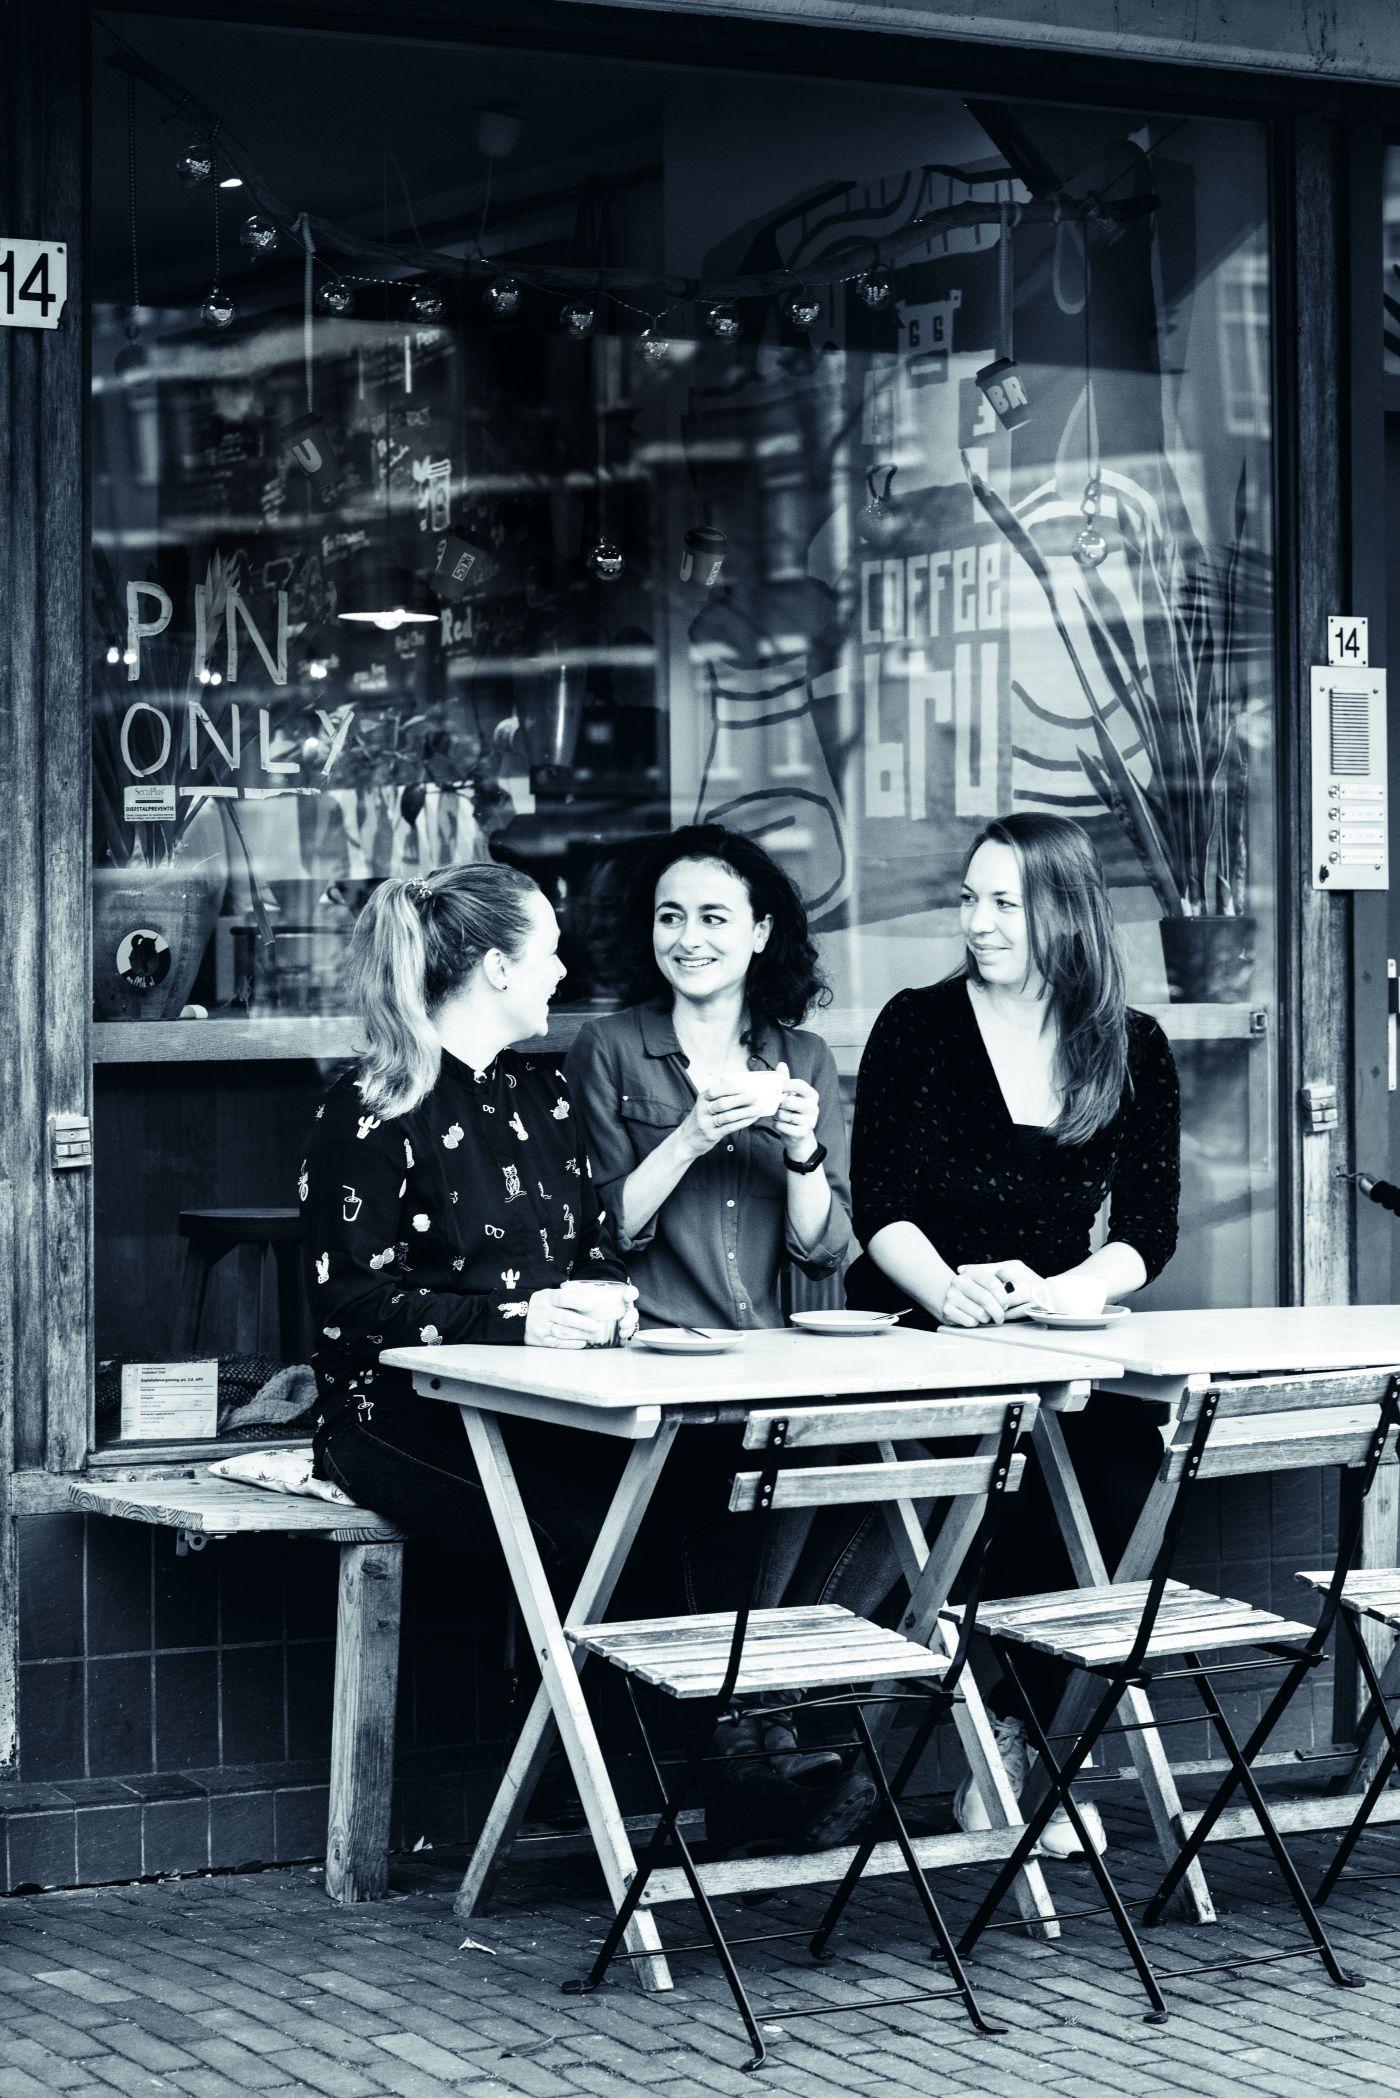 Publiek Inge van der Lans, Inouk Boerma & Reina Jongkind (Linelle Deunk)_0.